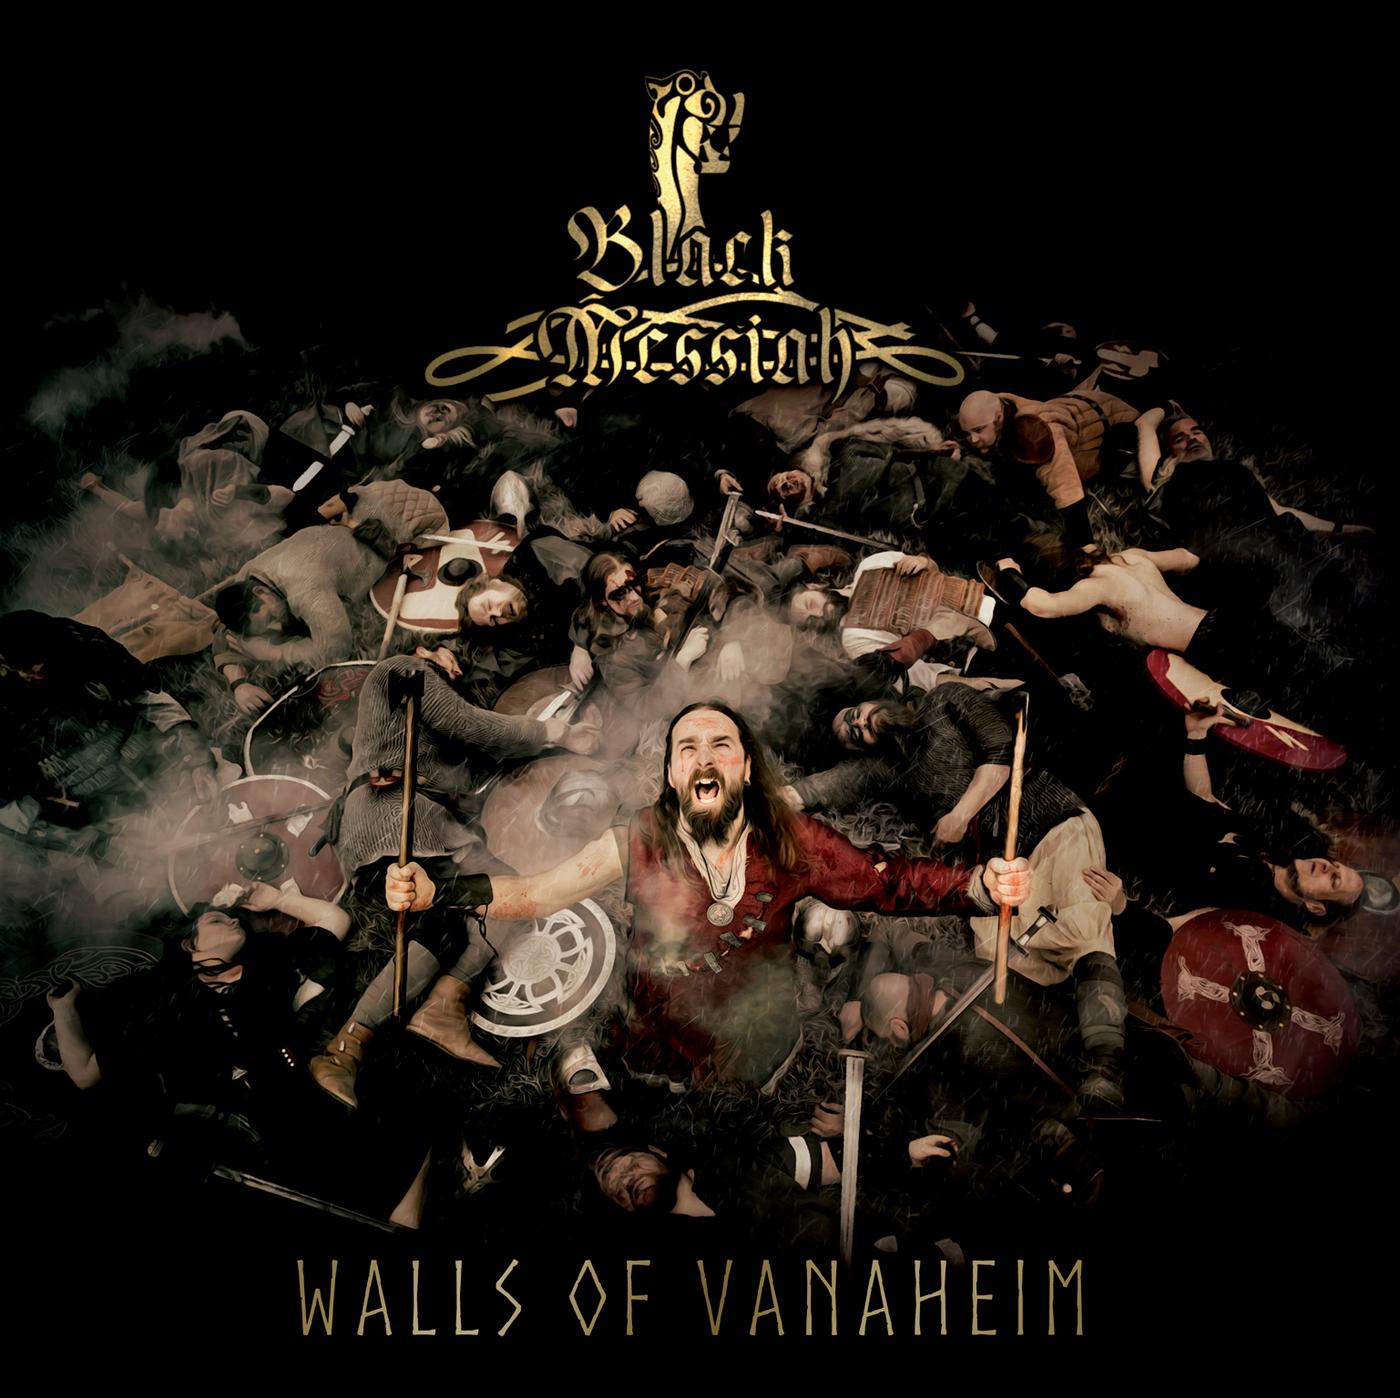 Black Messiah – Walls Of Vanaheim